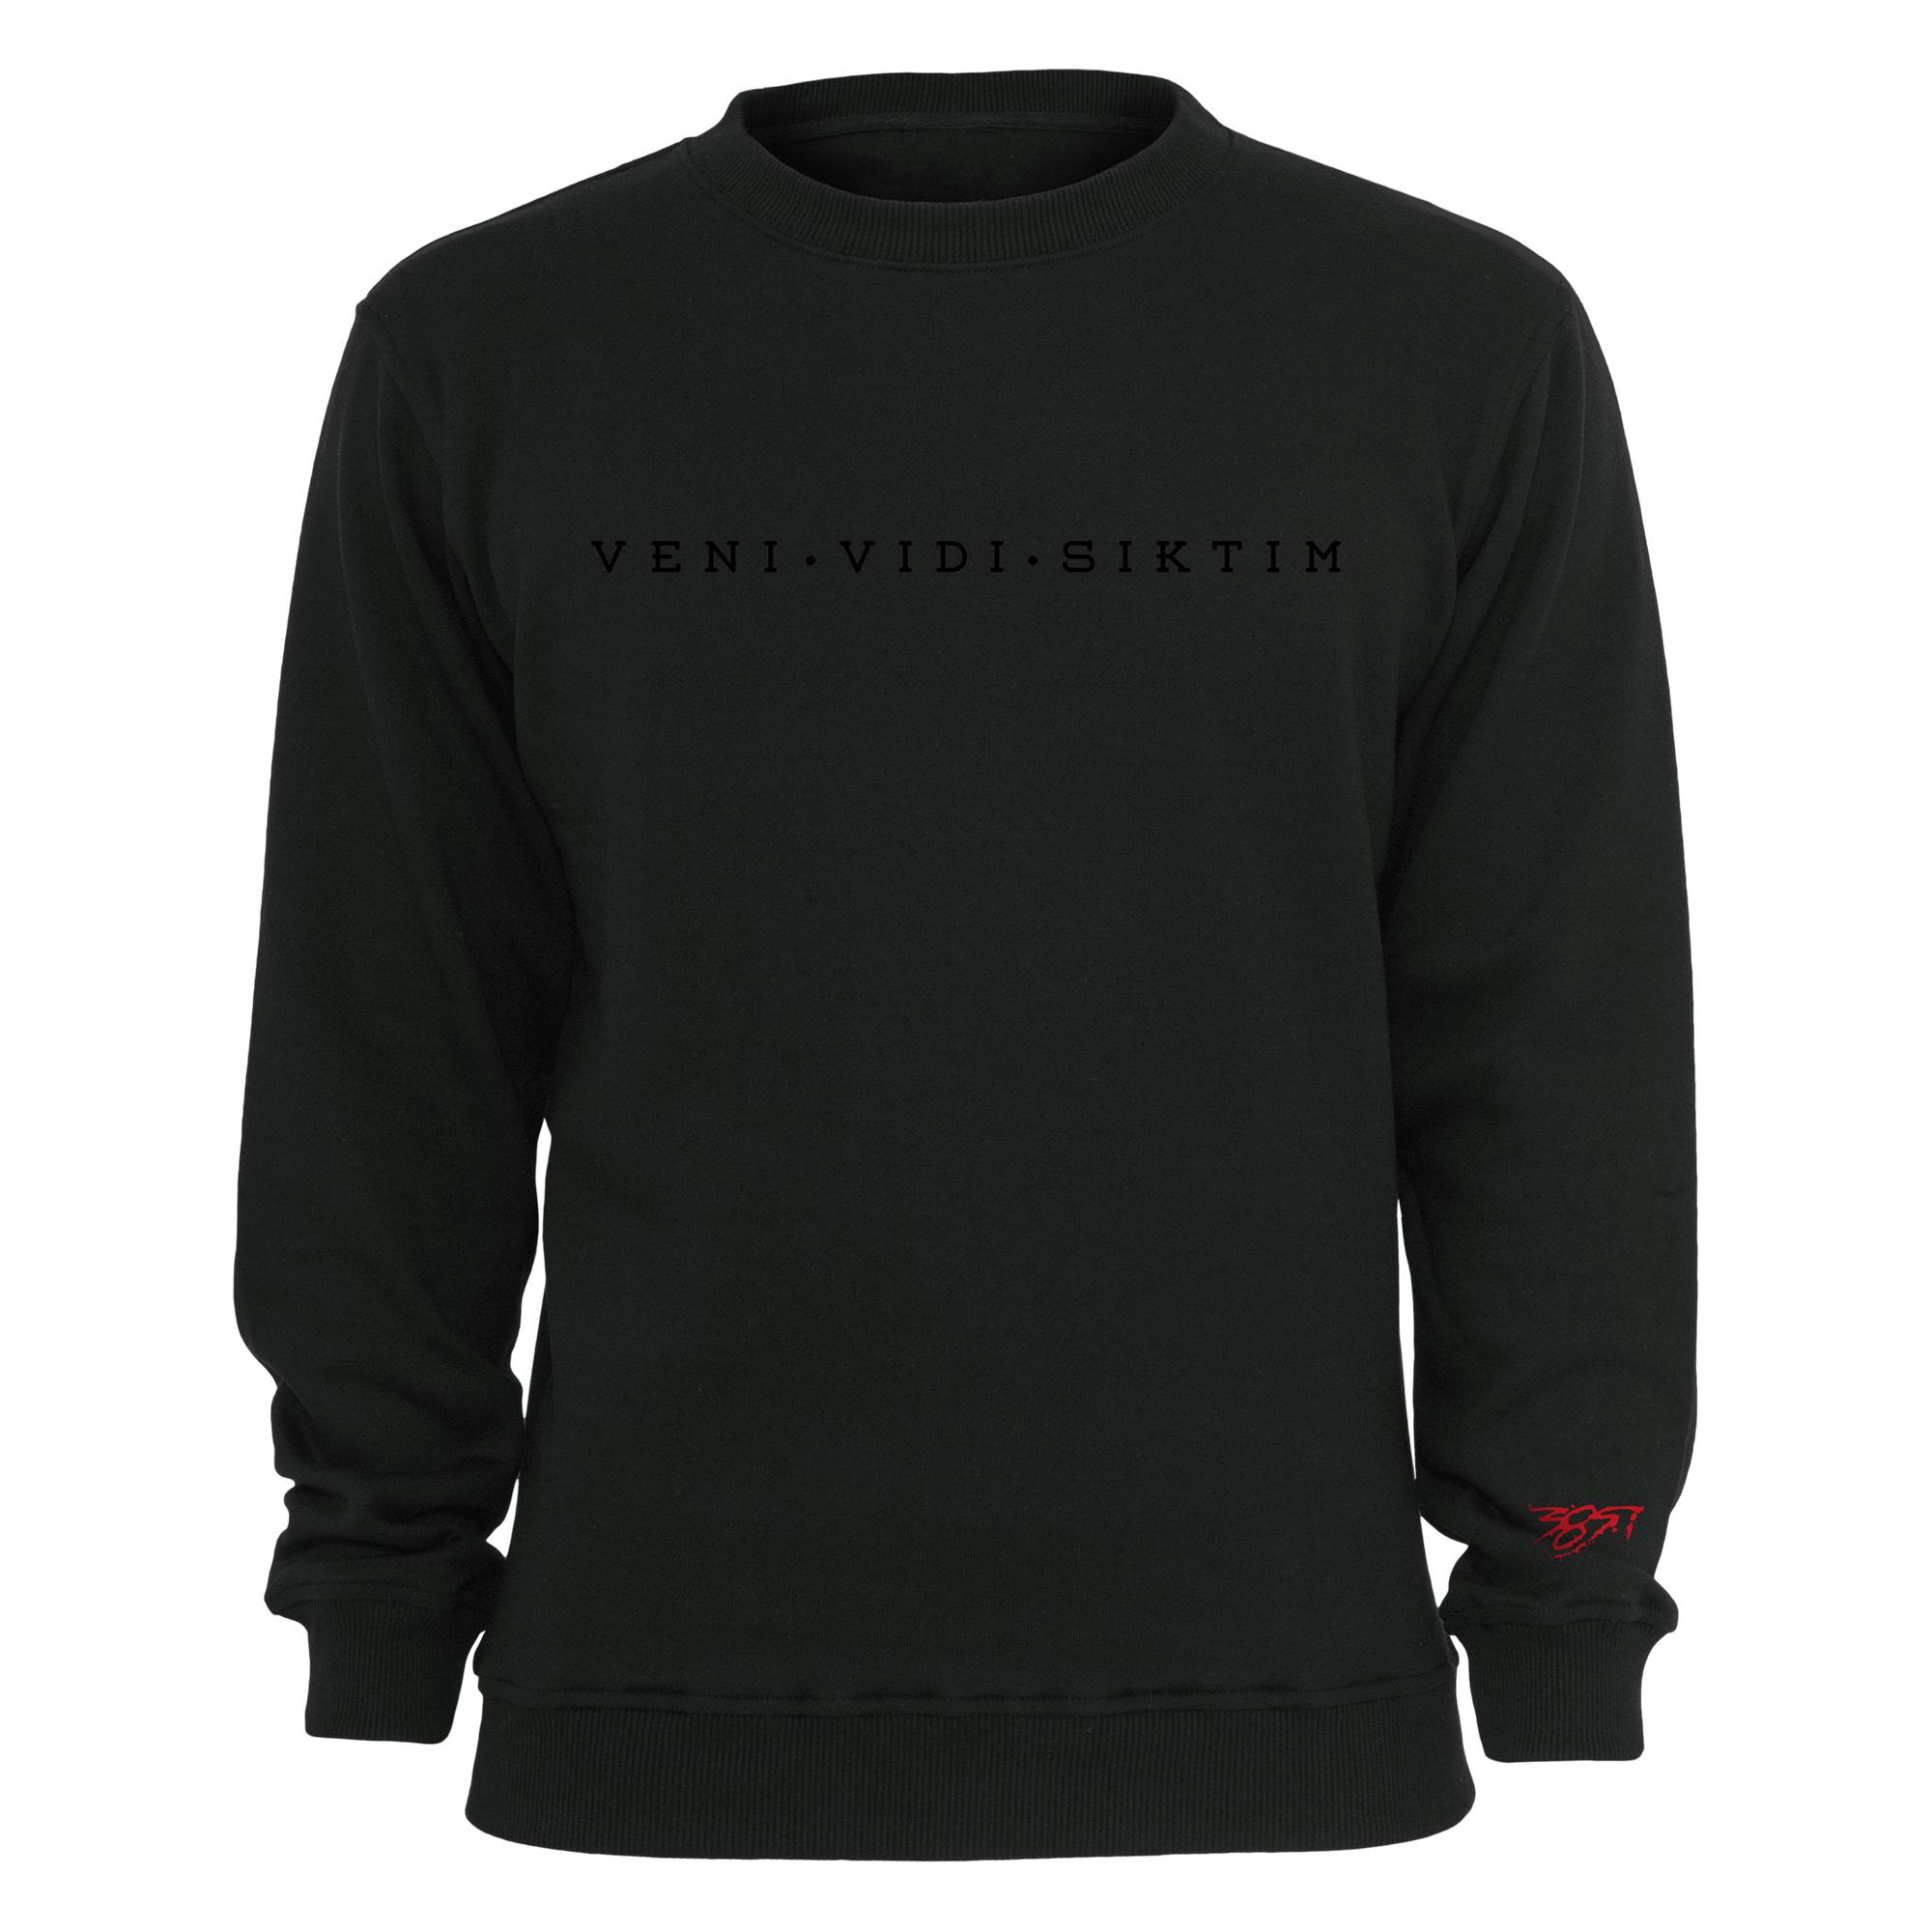 Veni Vidi Siktim - Black on Black von Nimo - Sweater jetzt im 385ideal Shop